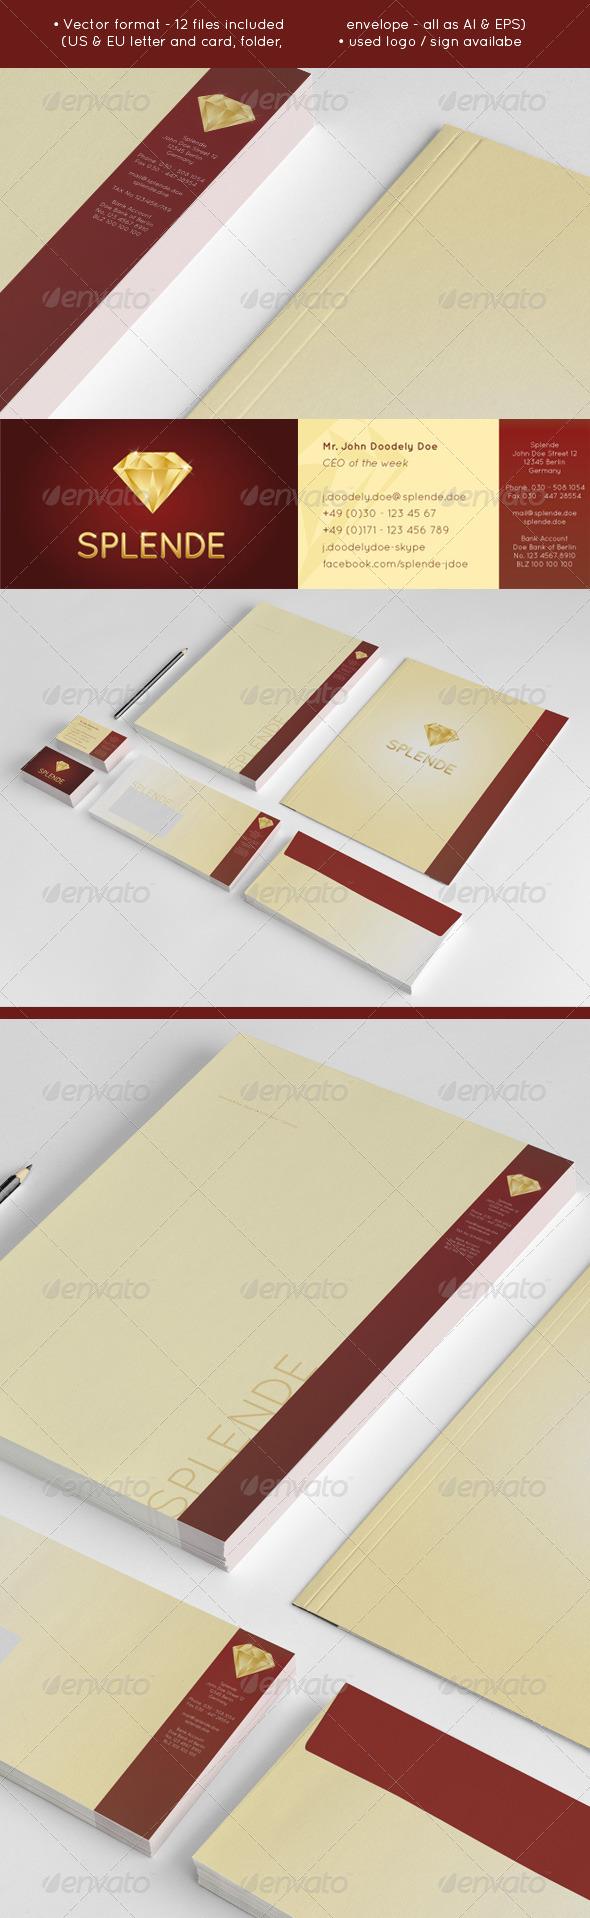 Splende - Golden Vector Diamond Jeweler Stationery - Stationery Print Templates